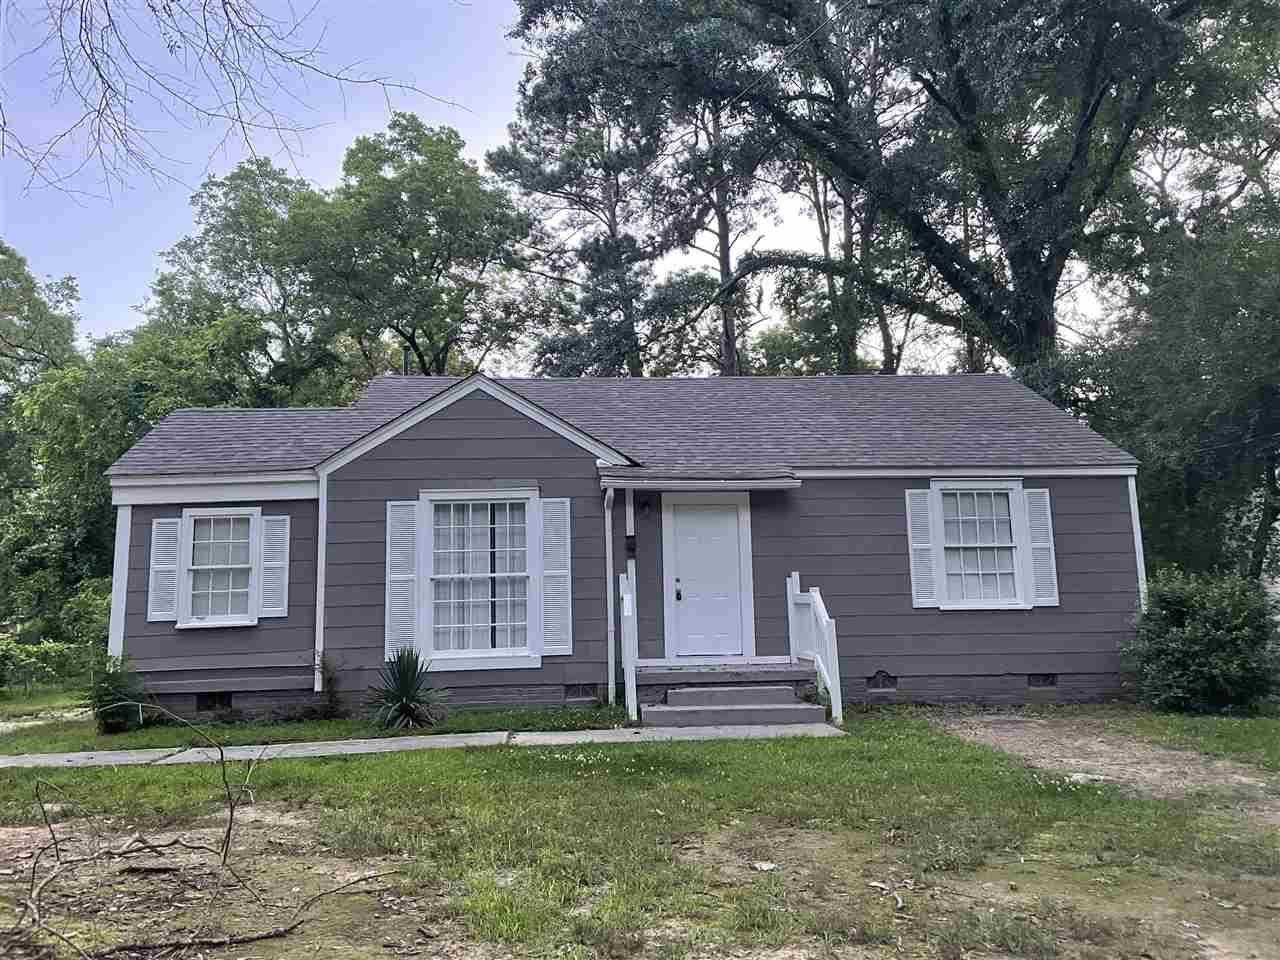 522 WOODBURY RD, Jackson, MS 39206 - MLS#: 341406